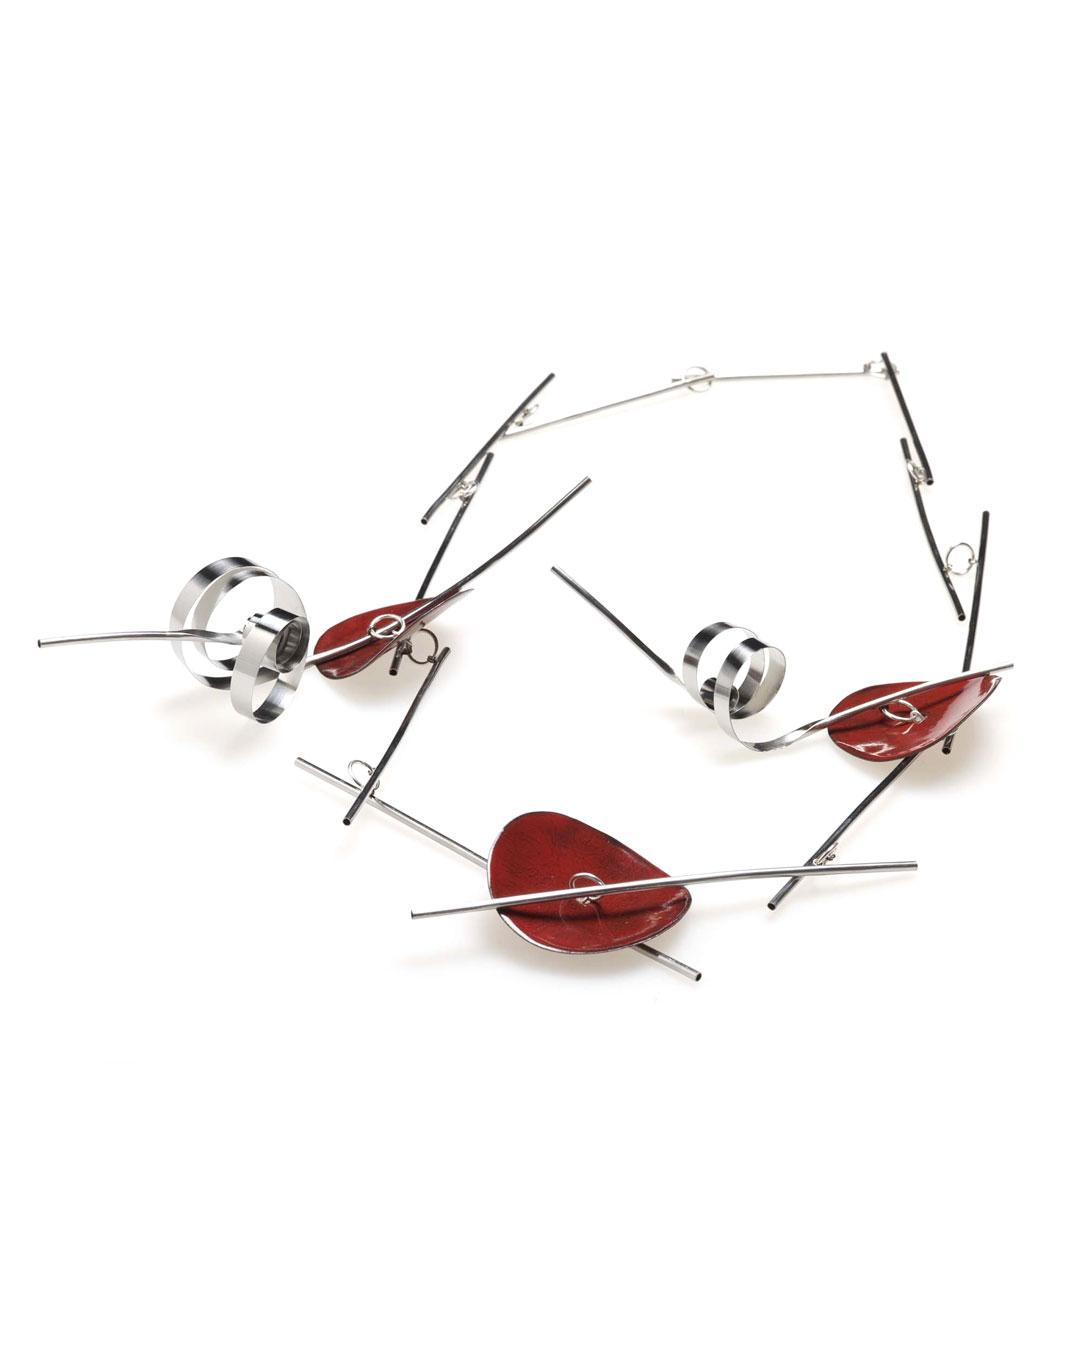 Andrea Wippermann, Japanischer Garten III (Japanese Garden III), 2011, necklace; enamelled copper and steel, silver, gold, 390 x 270 x 39 mm, €3650